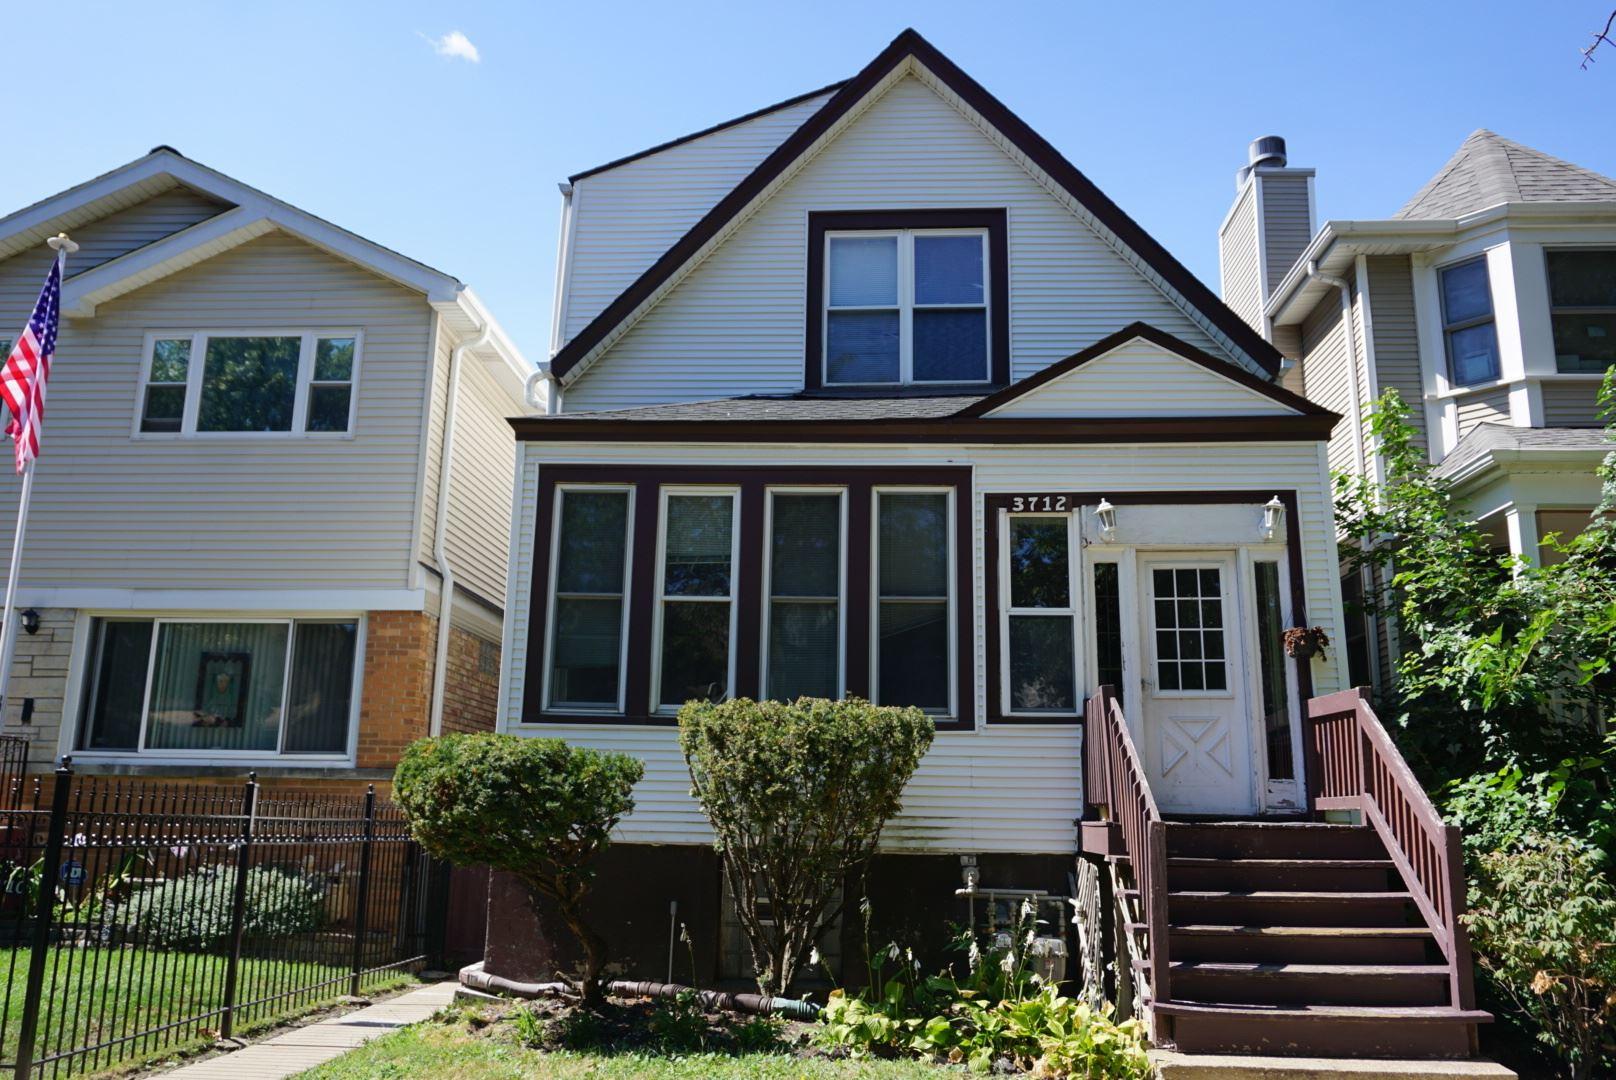 3712 N Francisco Avenue, Chicago, IL 60618 - #: 11214172